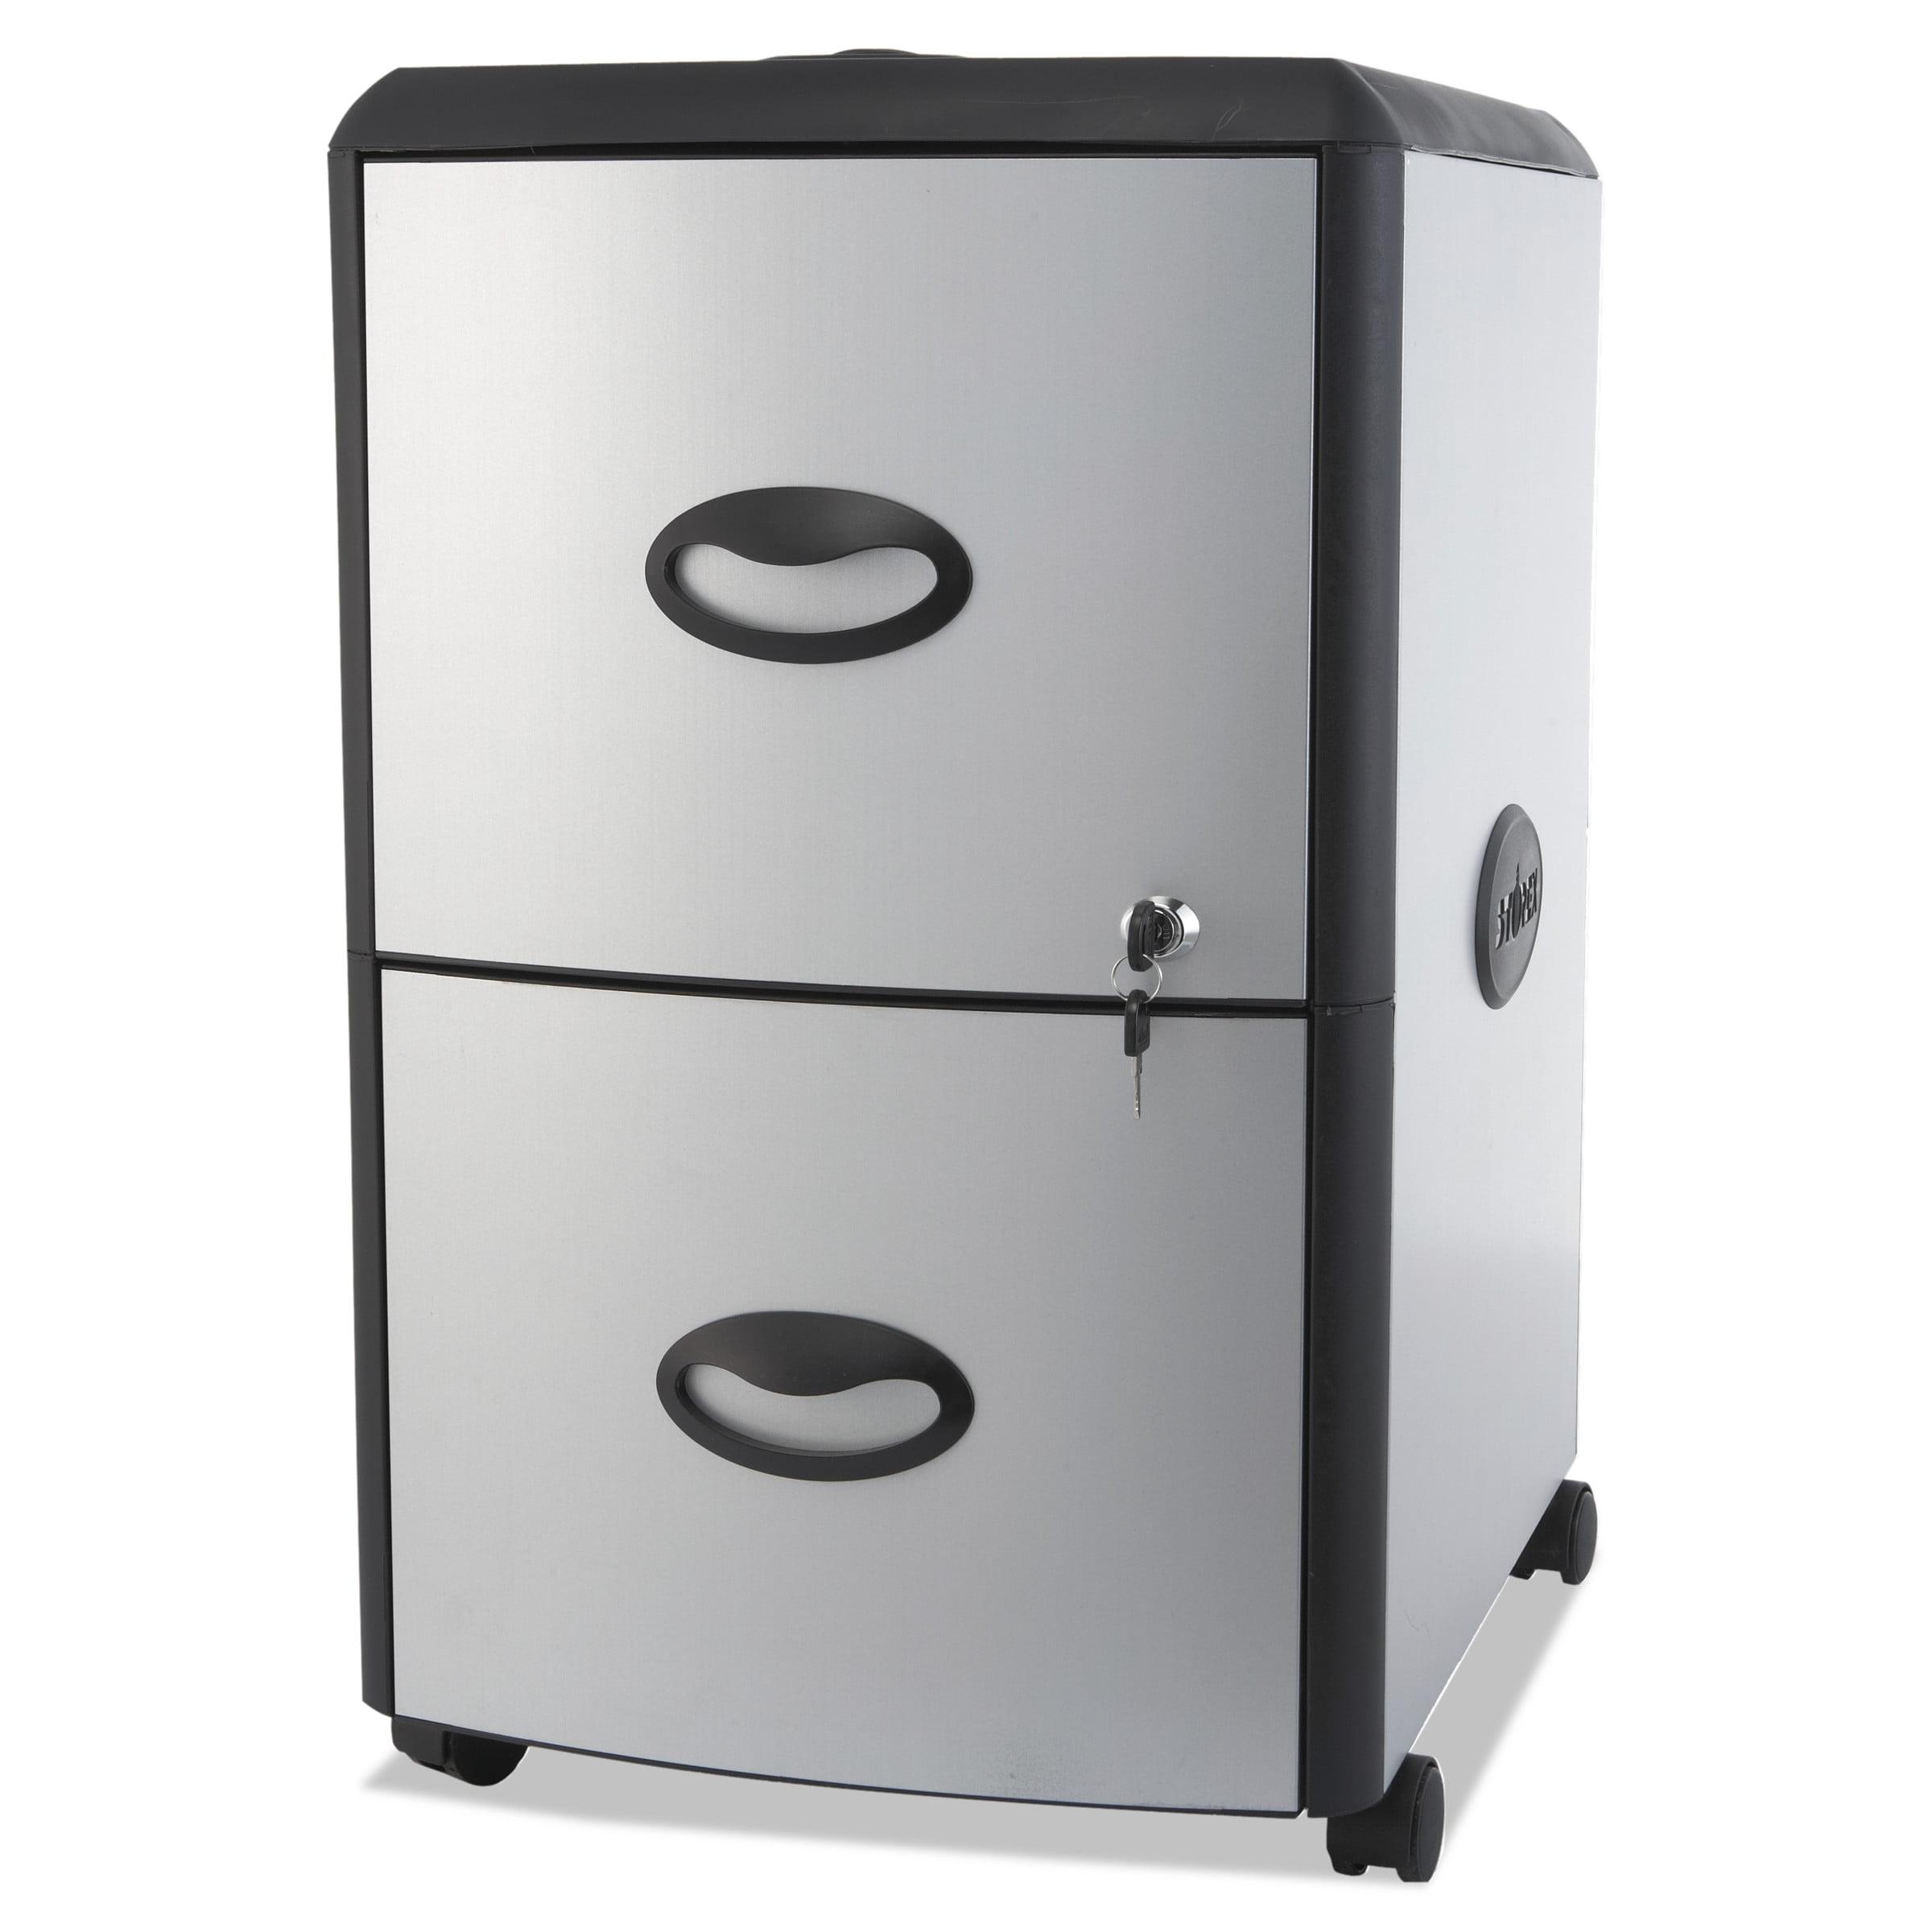 Storex Two-Drawer Mobile Filing Cabinet, Metal Siding, 19w x 15d x ...